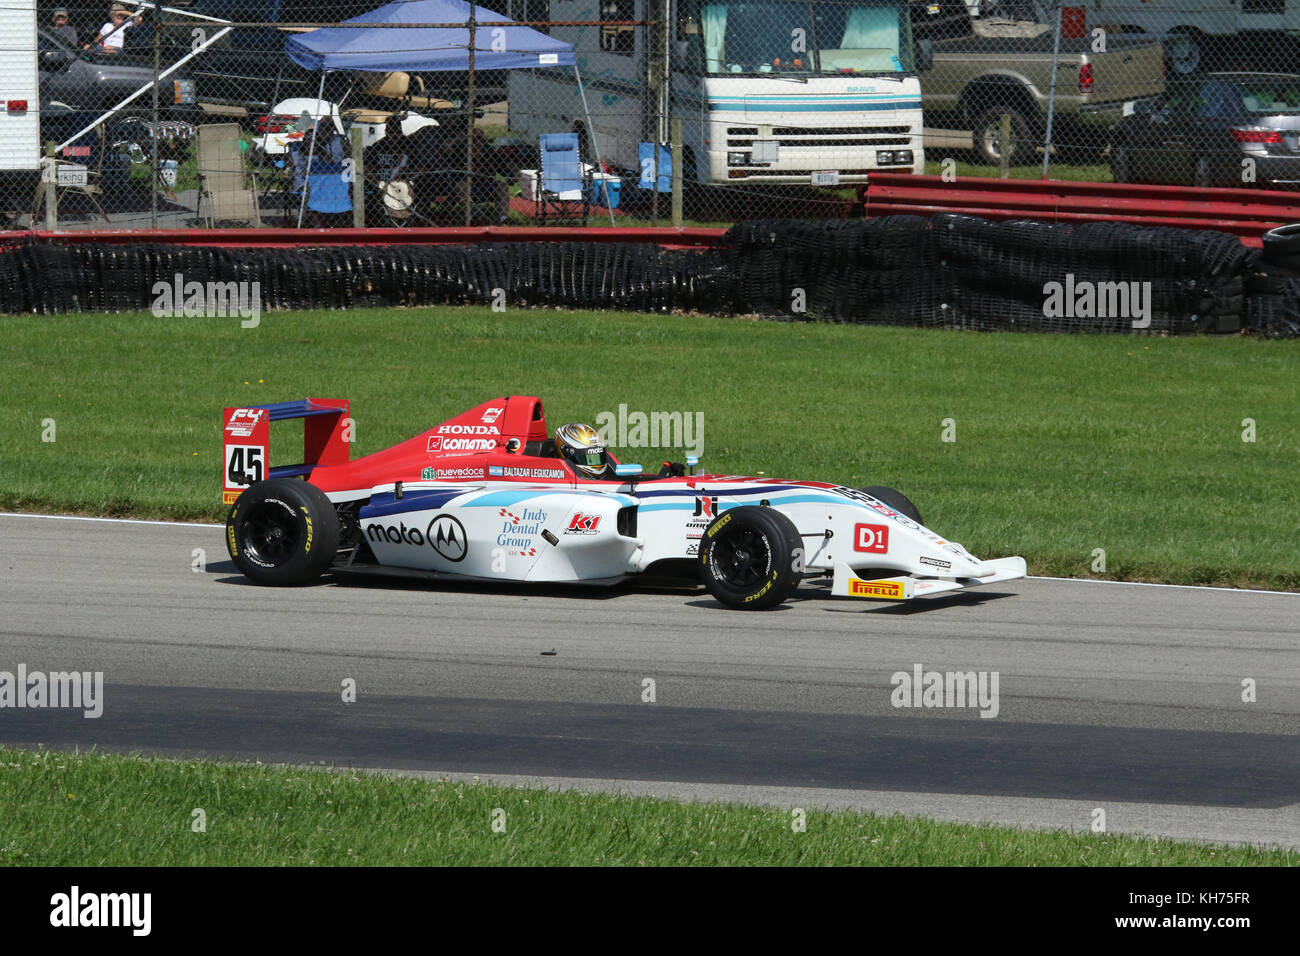 Baltazar Leguizamon. Car 45. Formula 4 Race. Mid-Ohio Sports Car Course. Lexington, Mansfield, Ohio, USA. - Stock Image